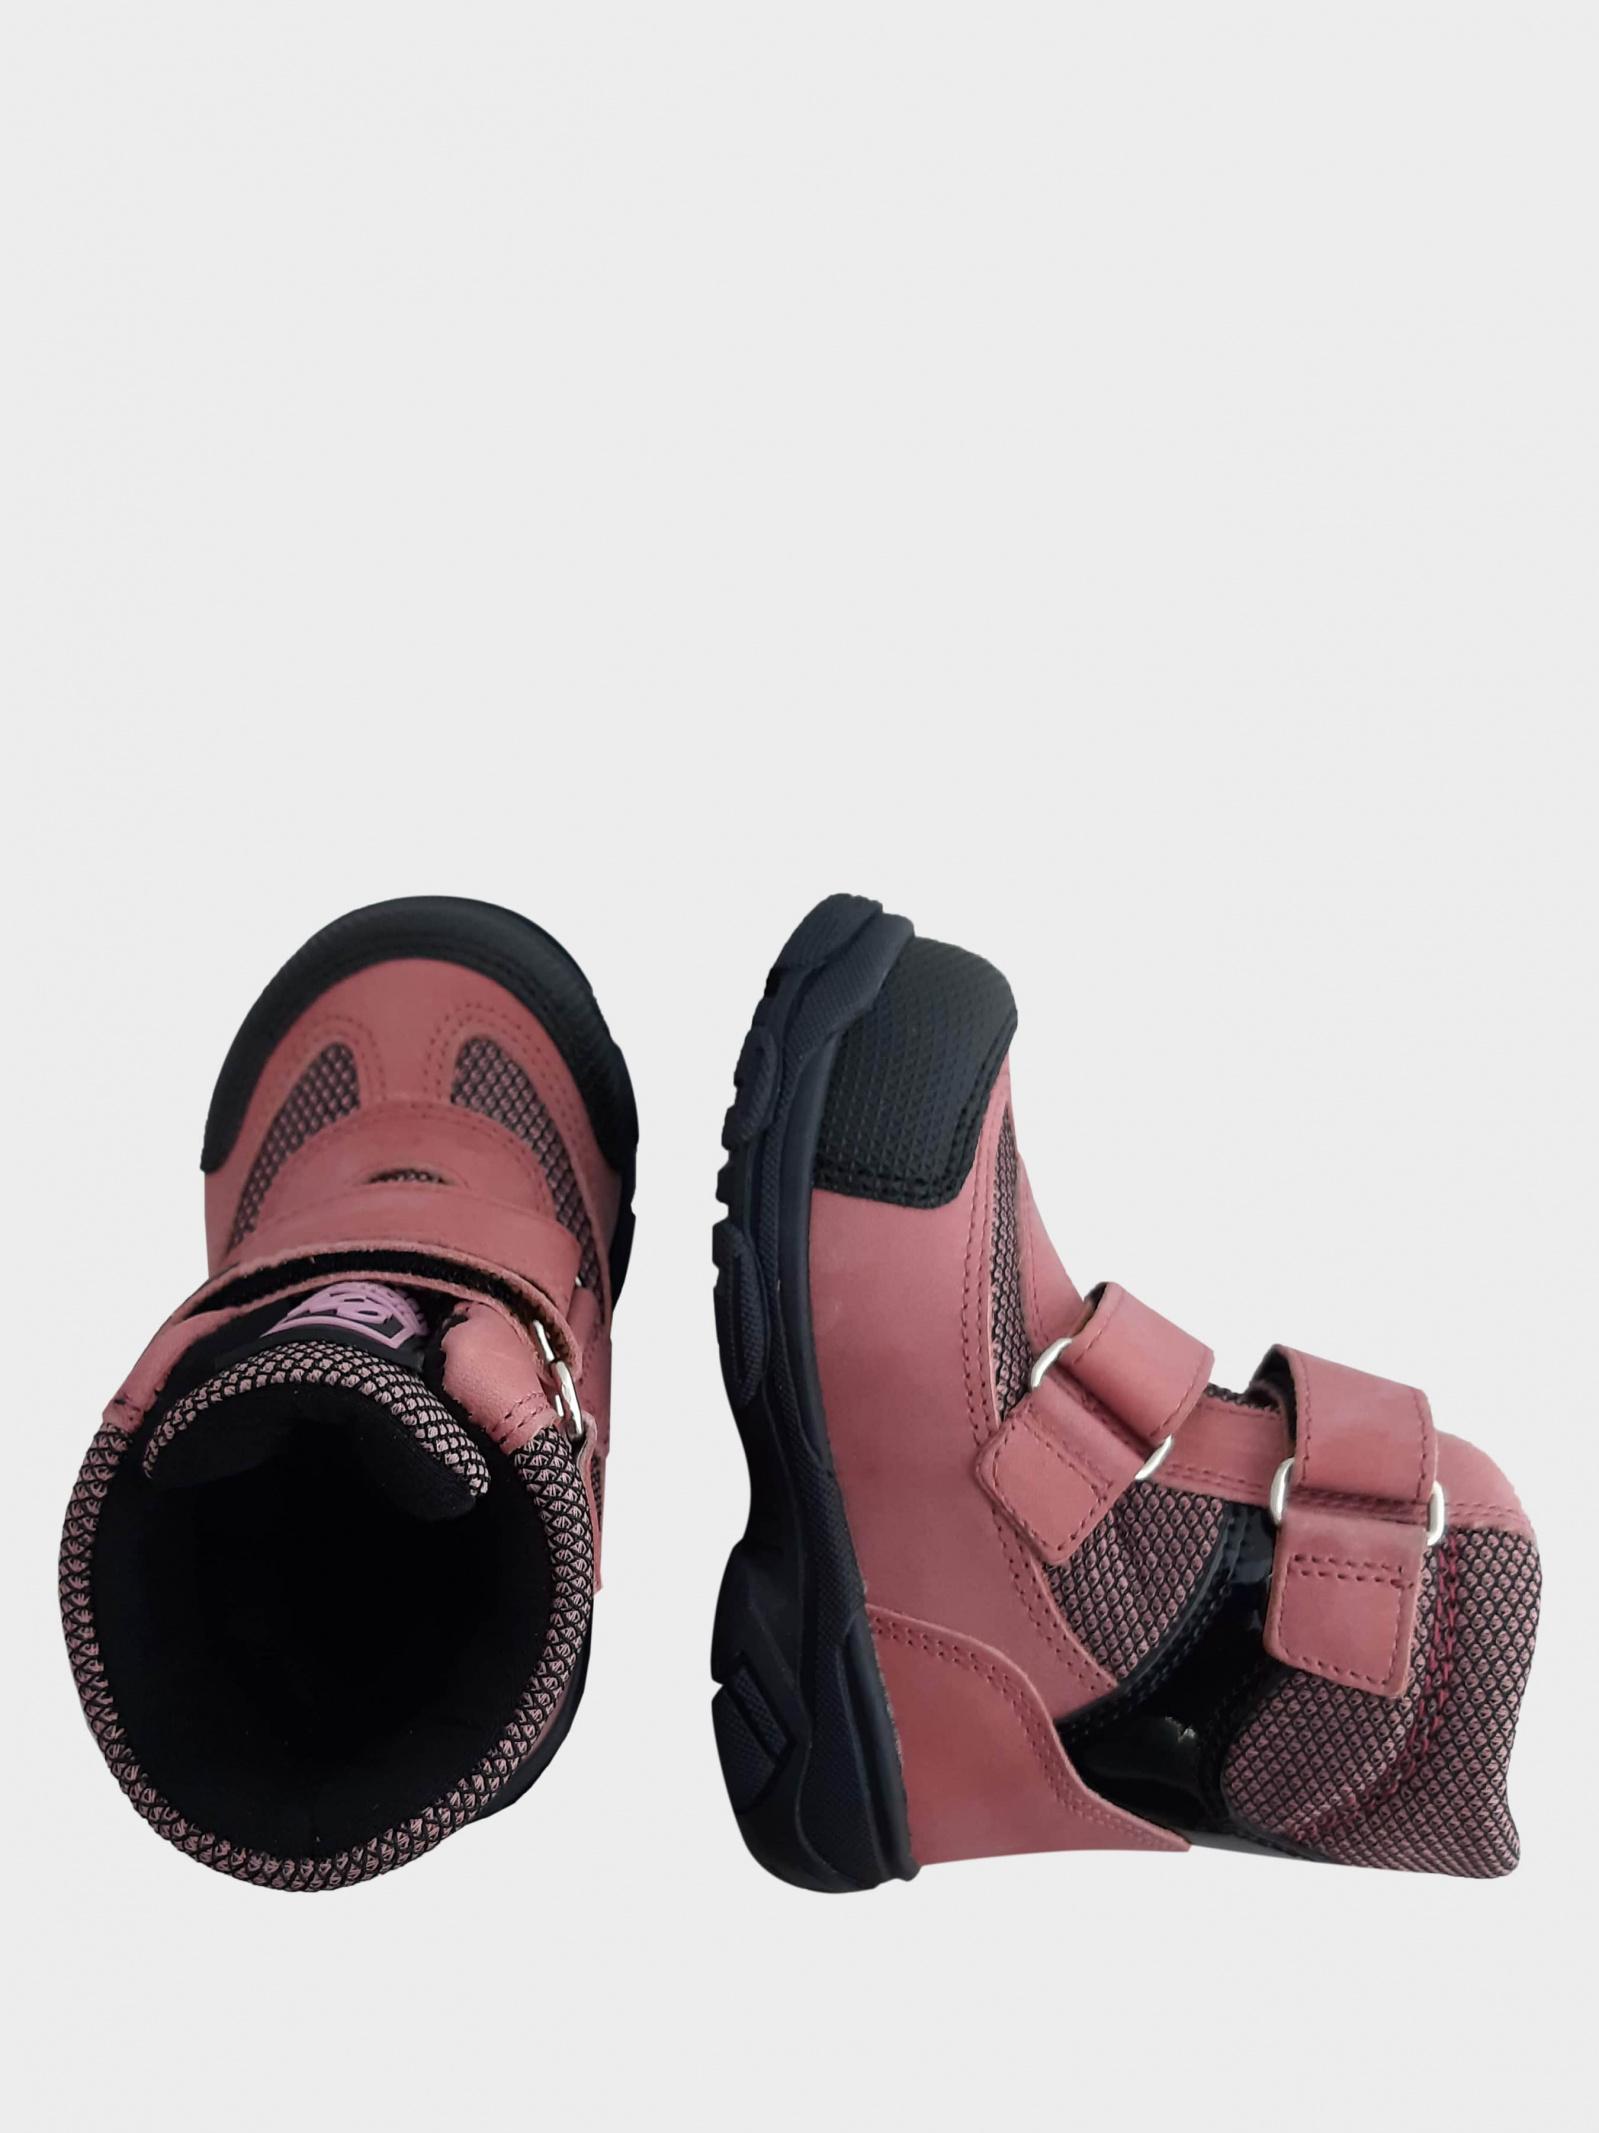 Ботинки для детей Ботинки Minimen 15PUDRA 15PUDRA цена обуви, 2017